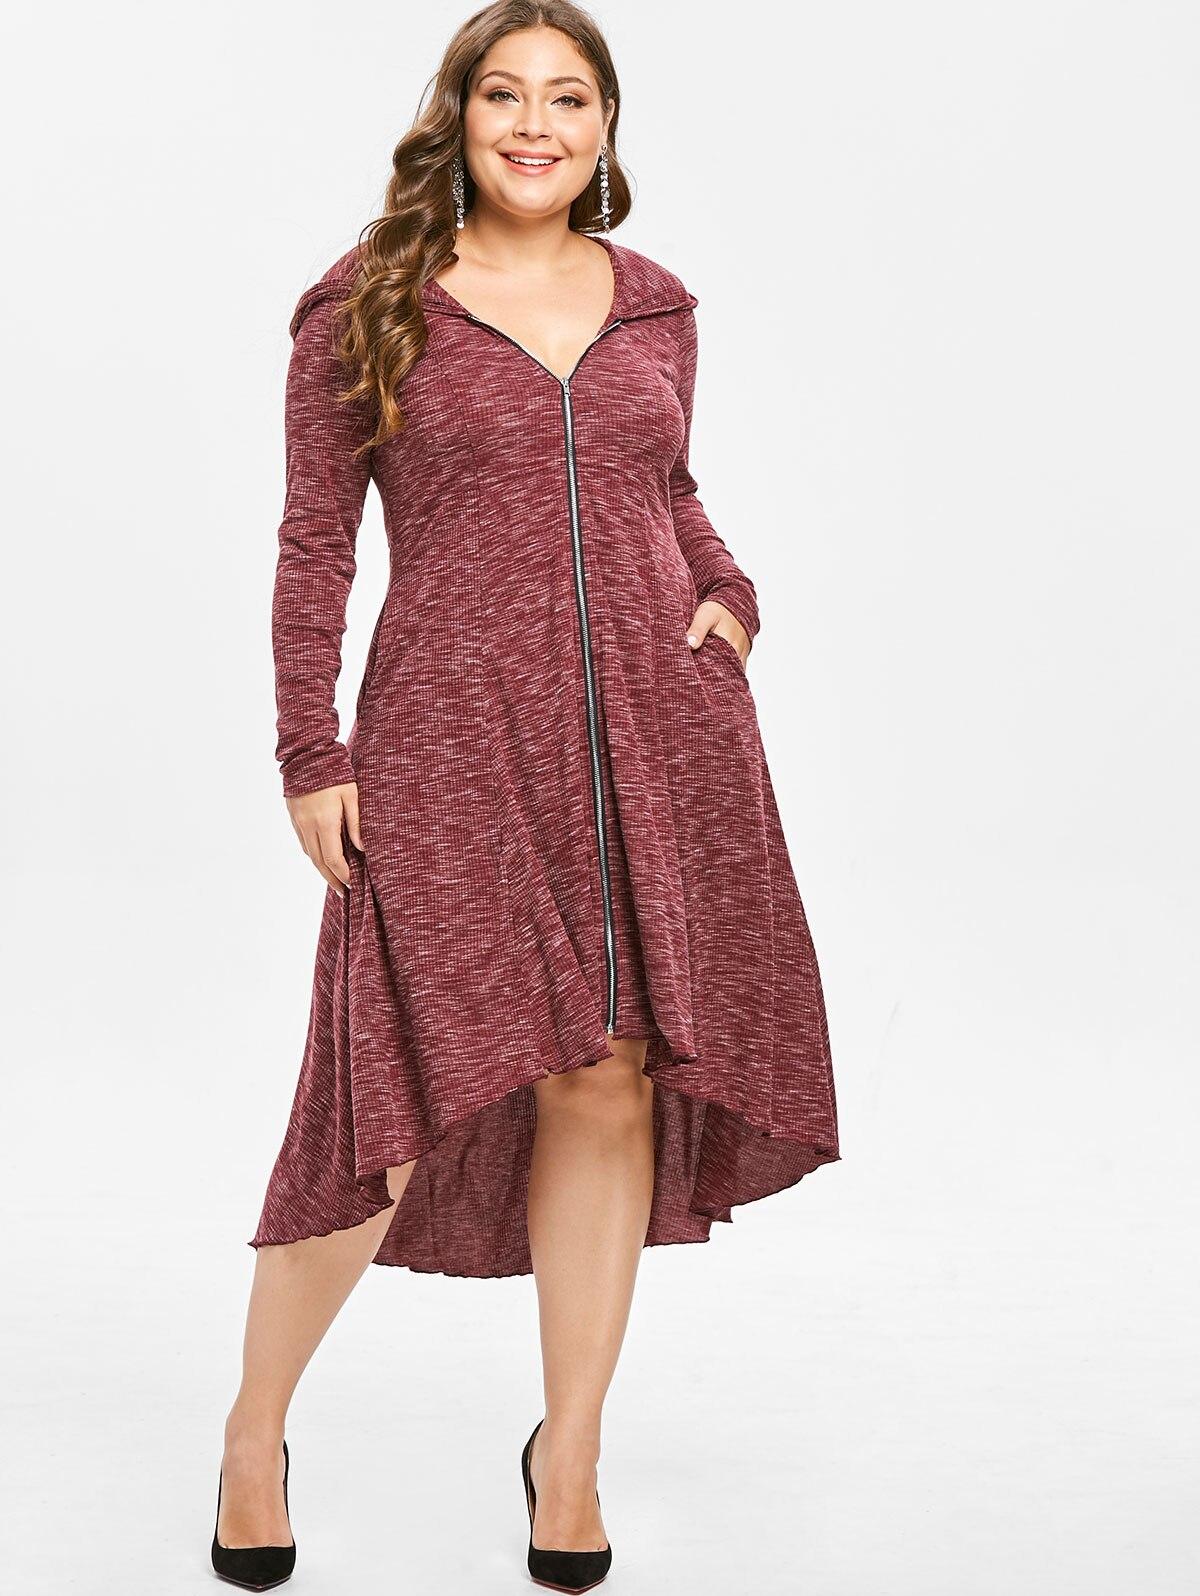 US $19.44 48% OFF Wipalo Plus Size Zip Front Hooded Long Sleeve High Low  Dress V Neck Long Sleeves Asymmetrical Women Dress Vestido 2019 Clothing-in  ...